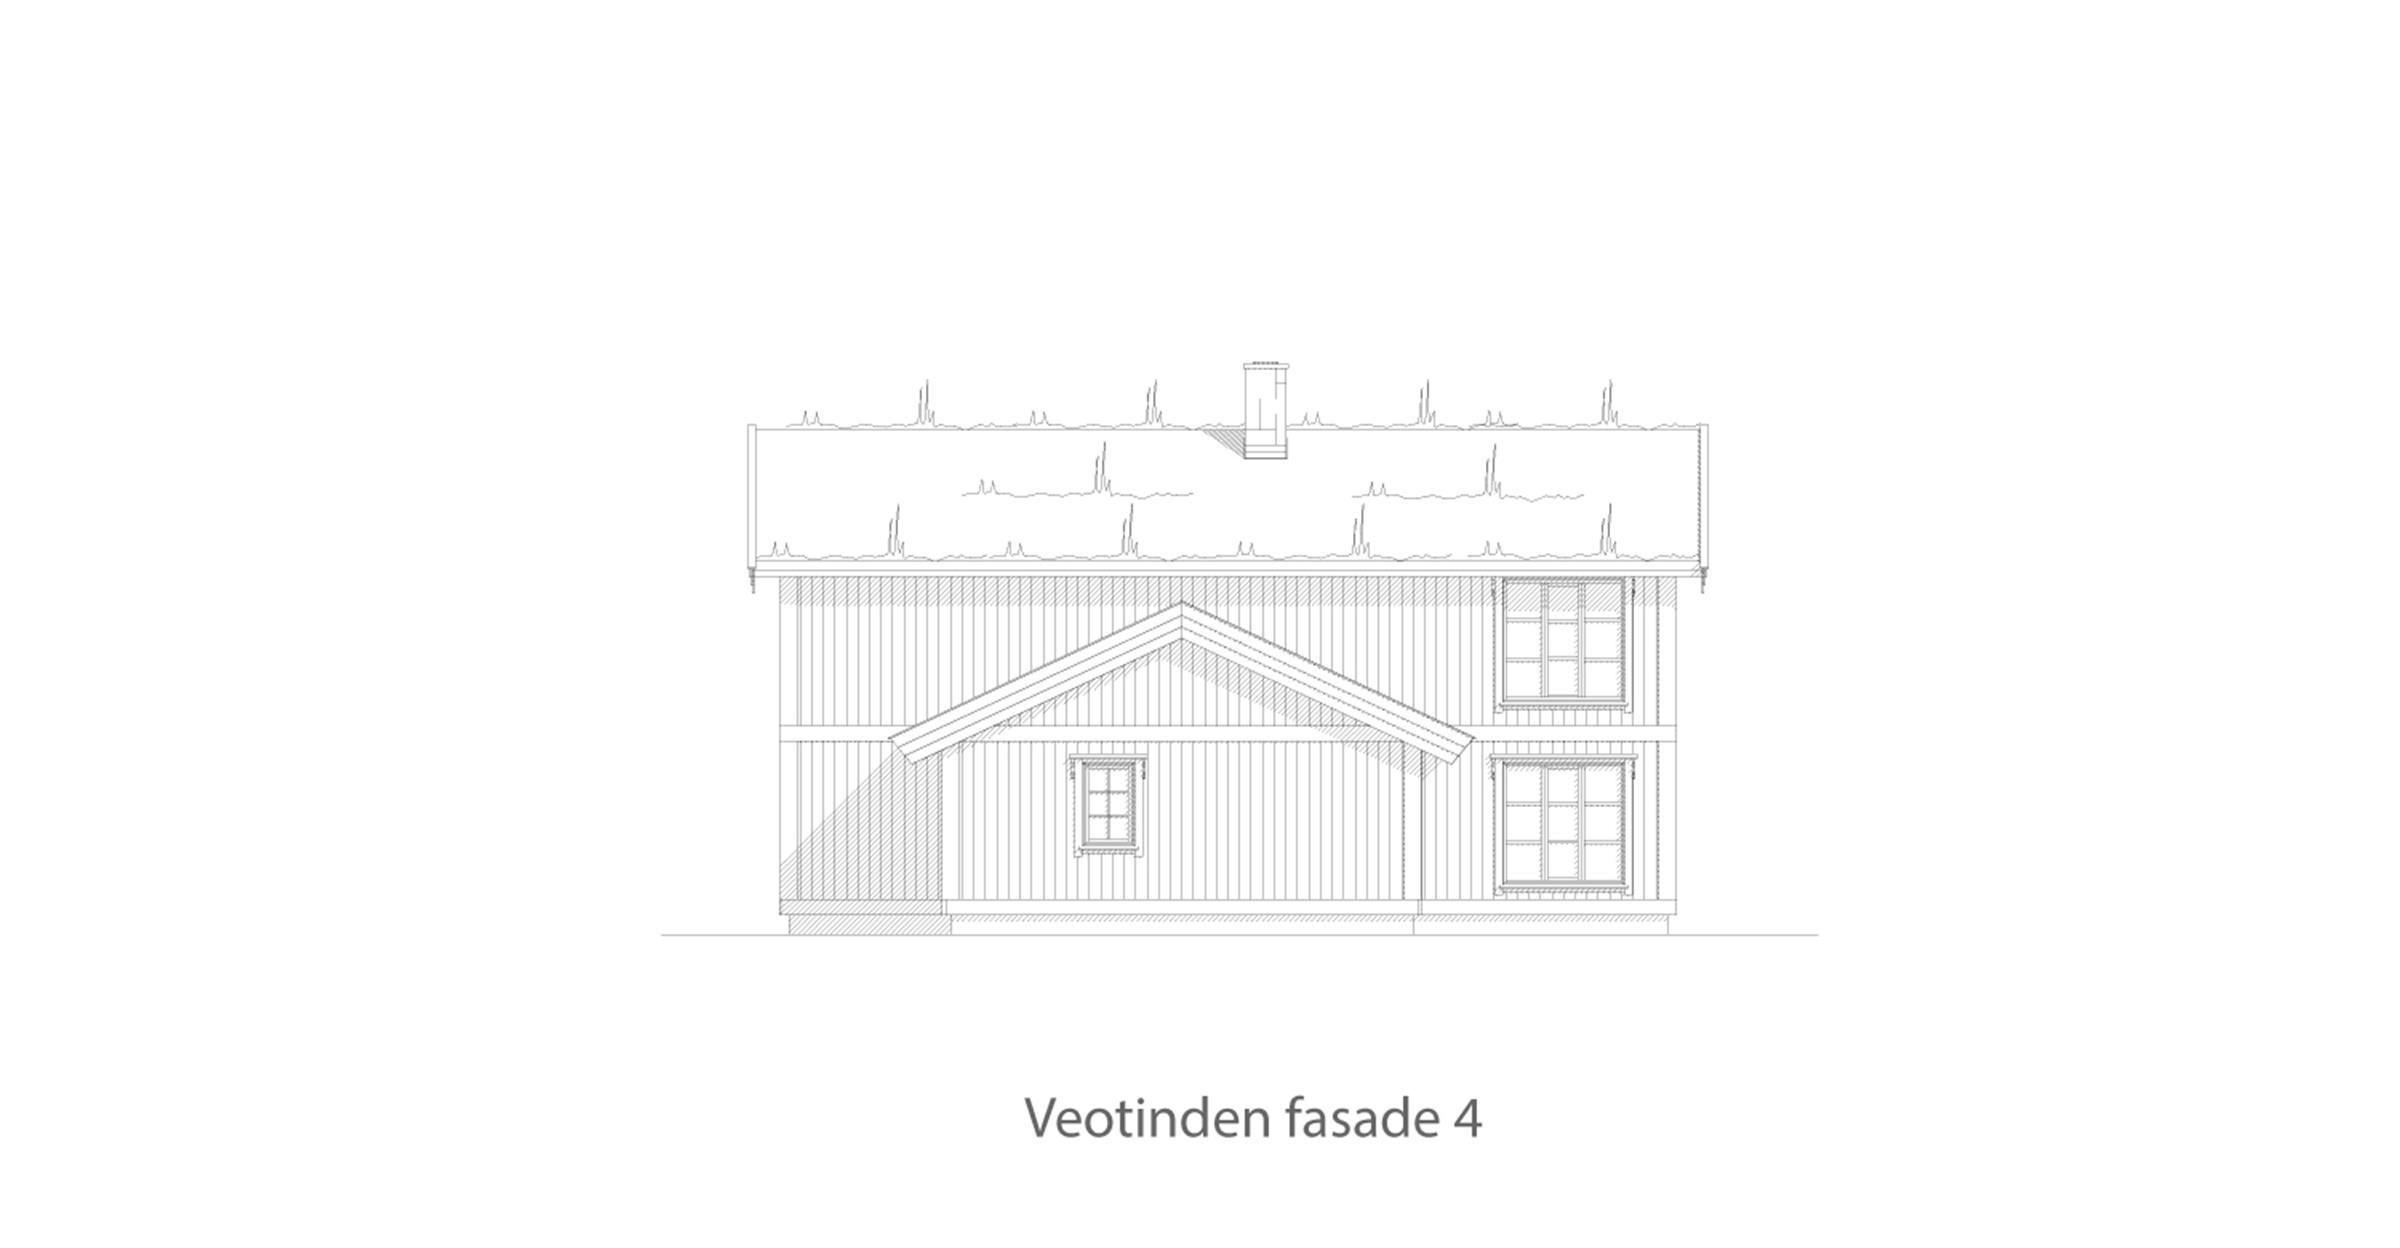 Veotinden fasade 4